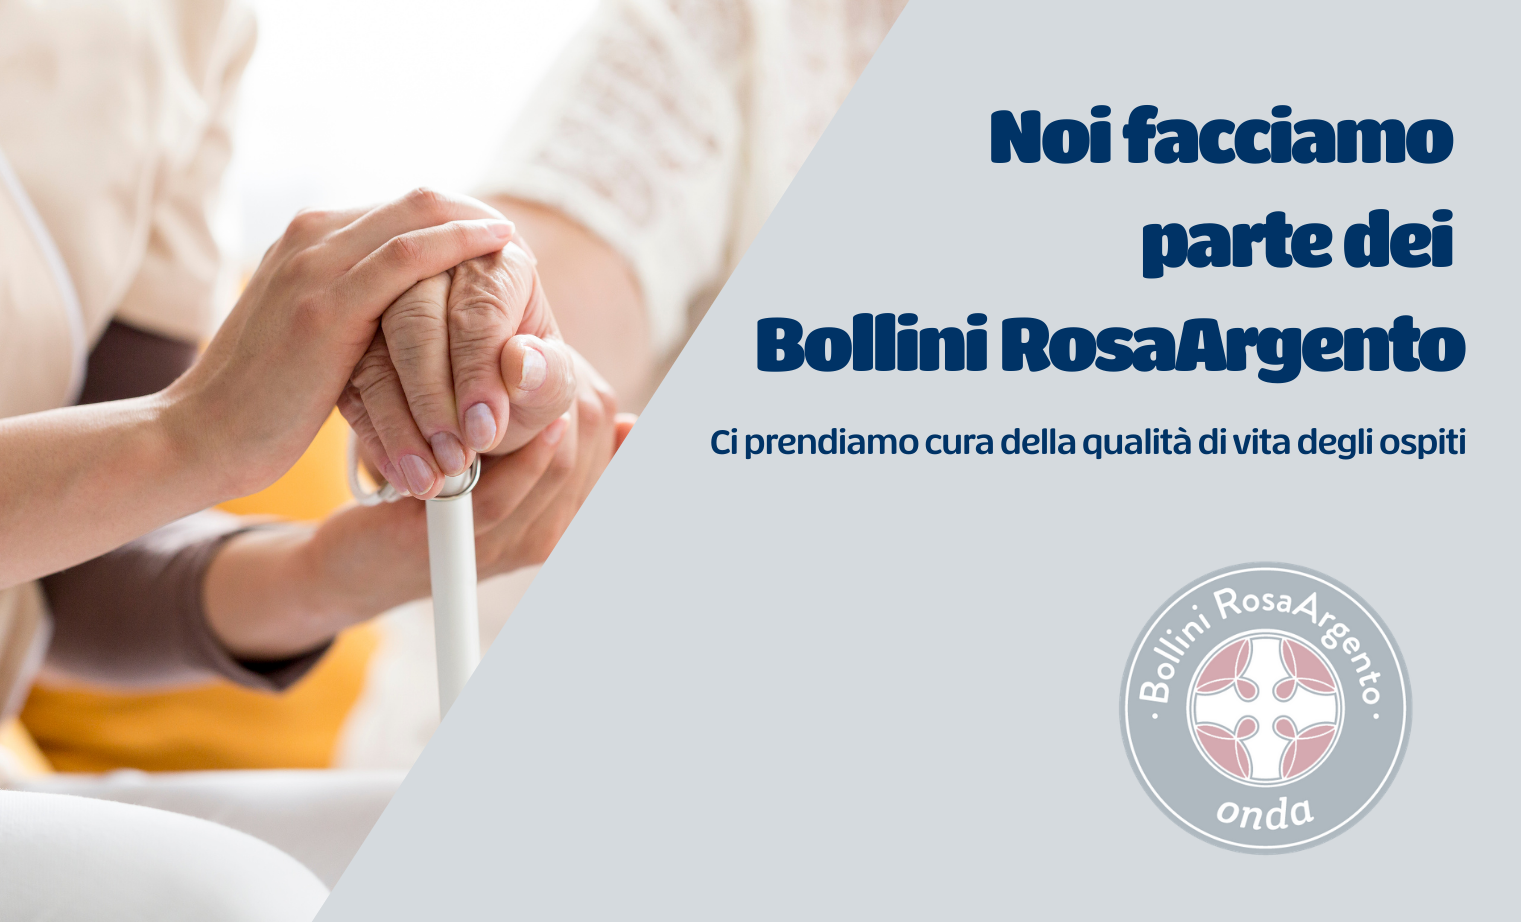 Bollini RosaArgento, un premio importante!